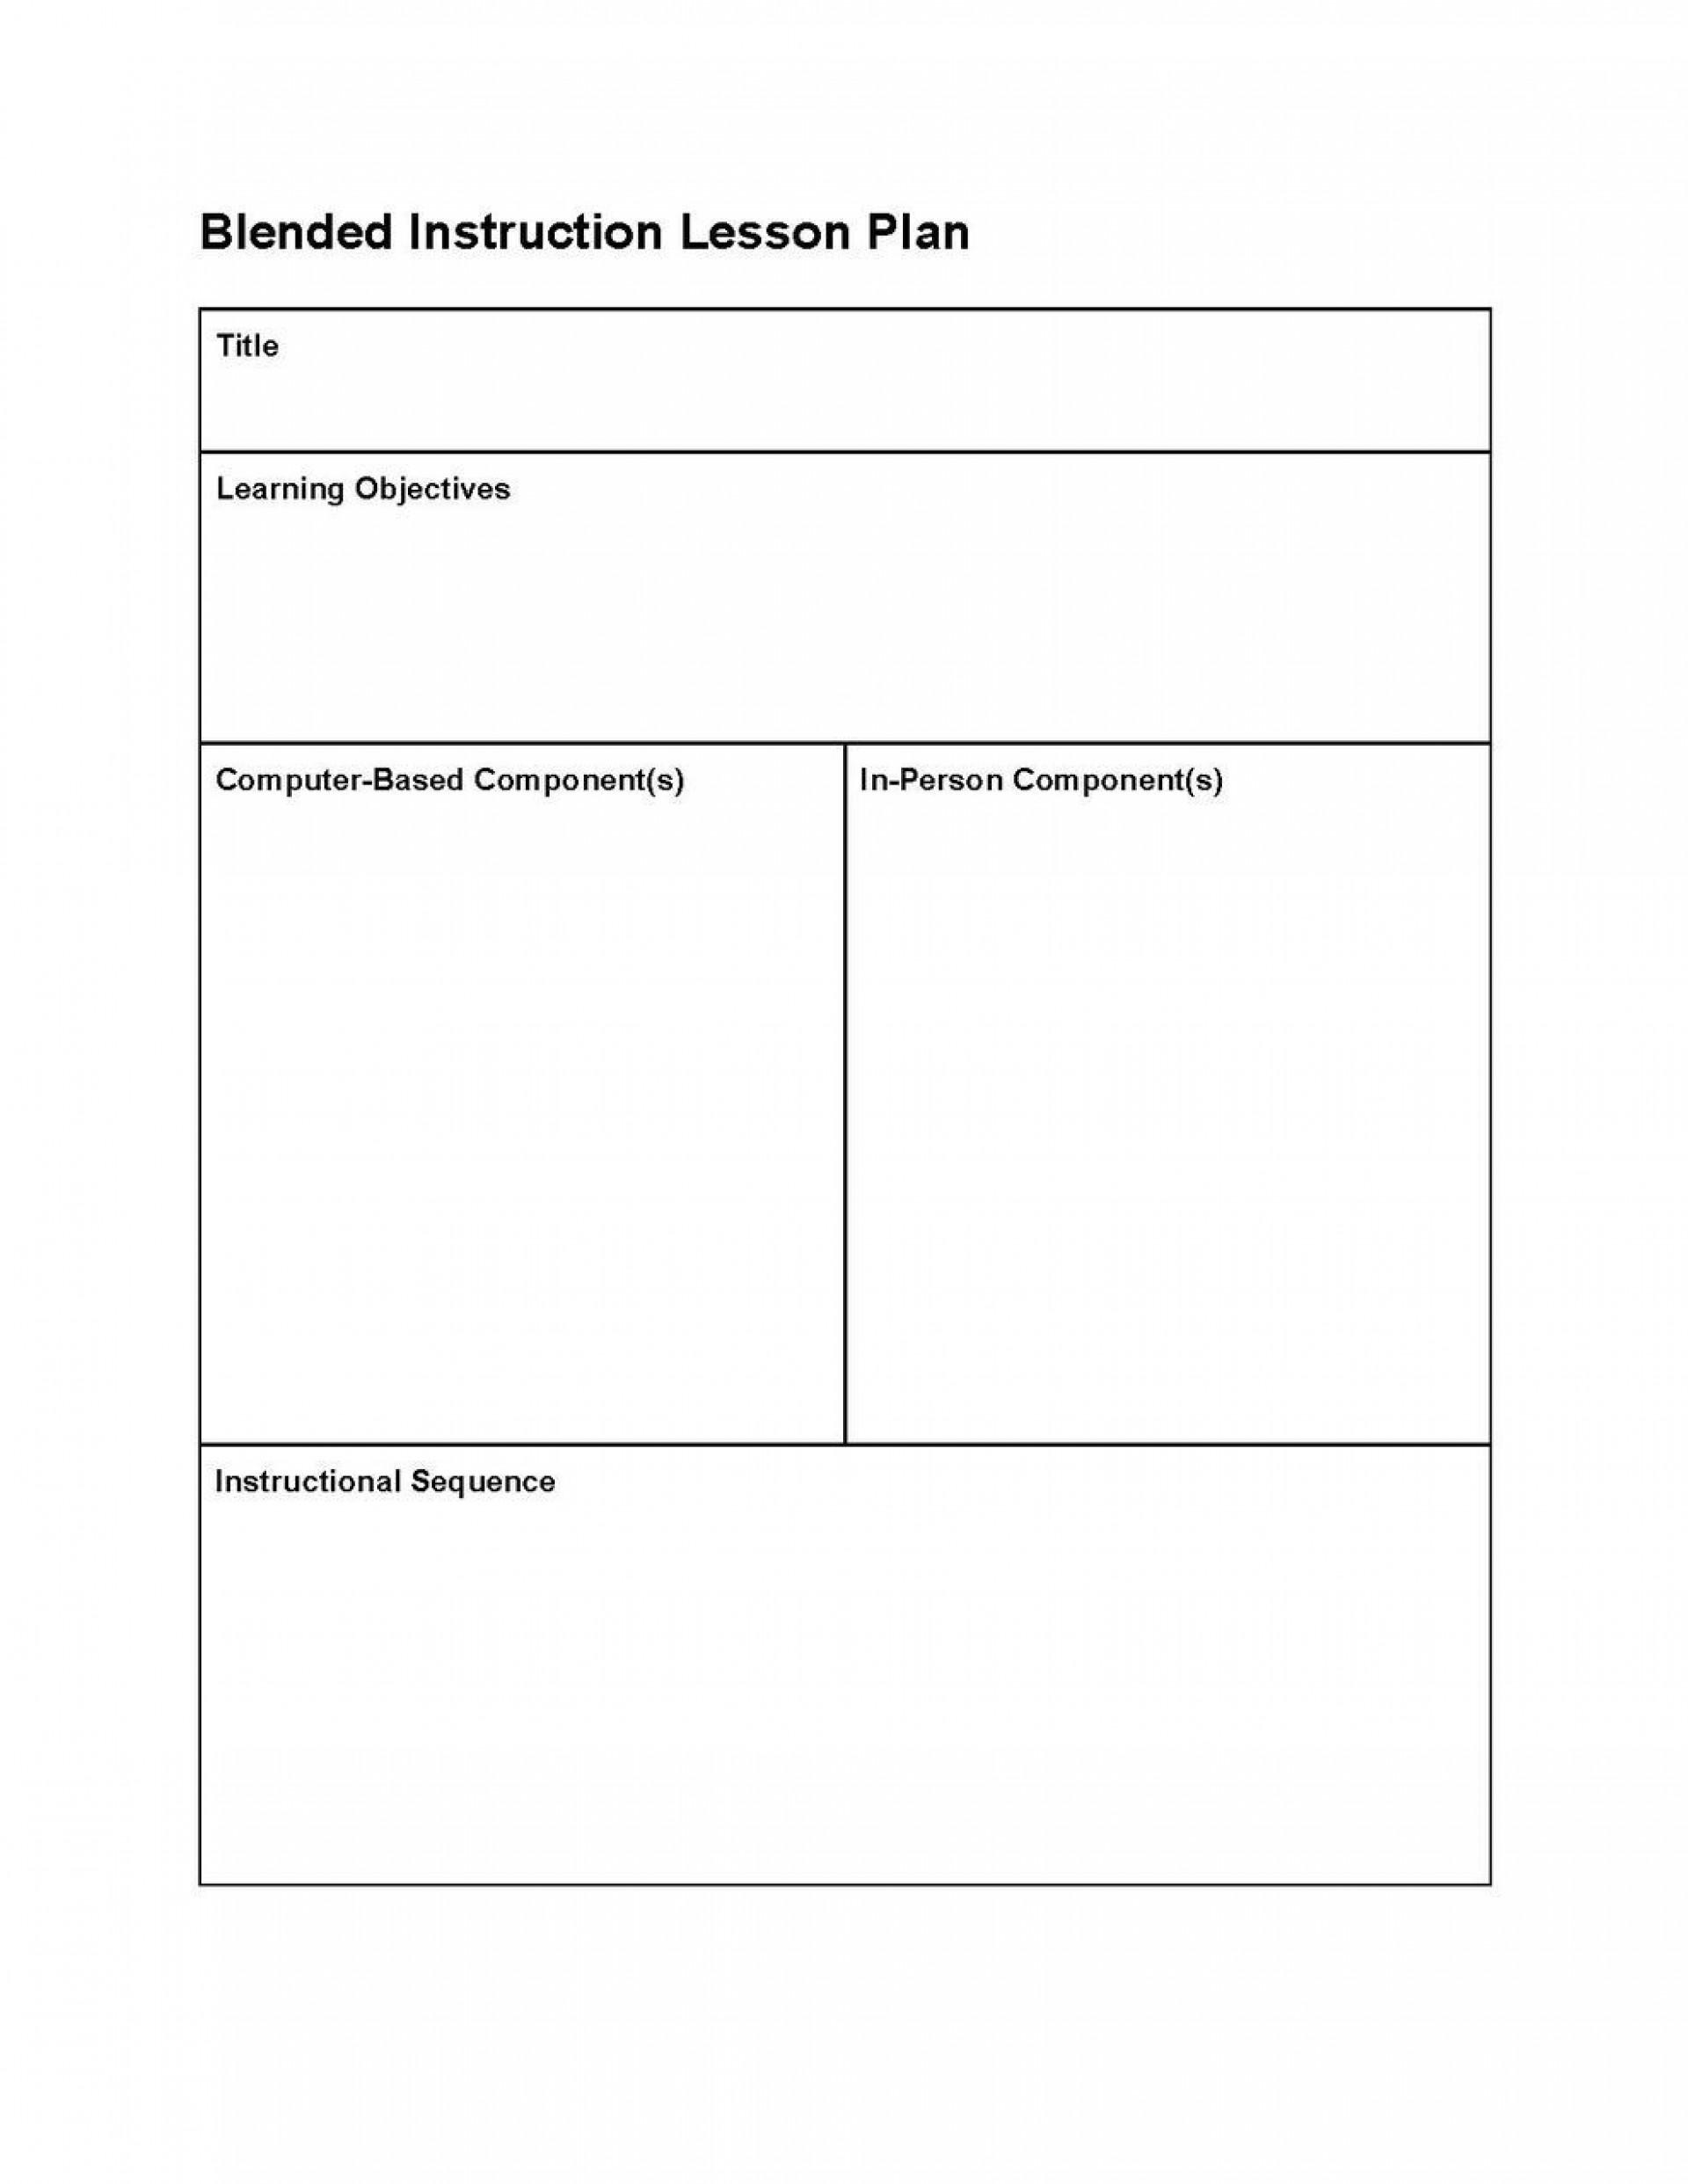 000 Fascinating Editable Lesson Plan Template Idea  Templates For Preschool Word Free1920